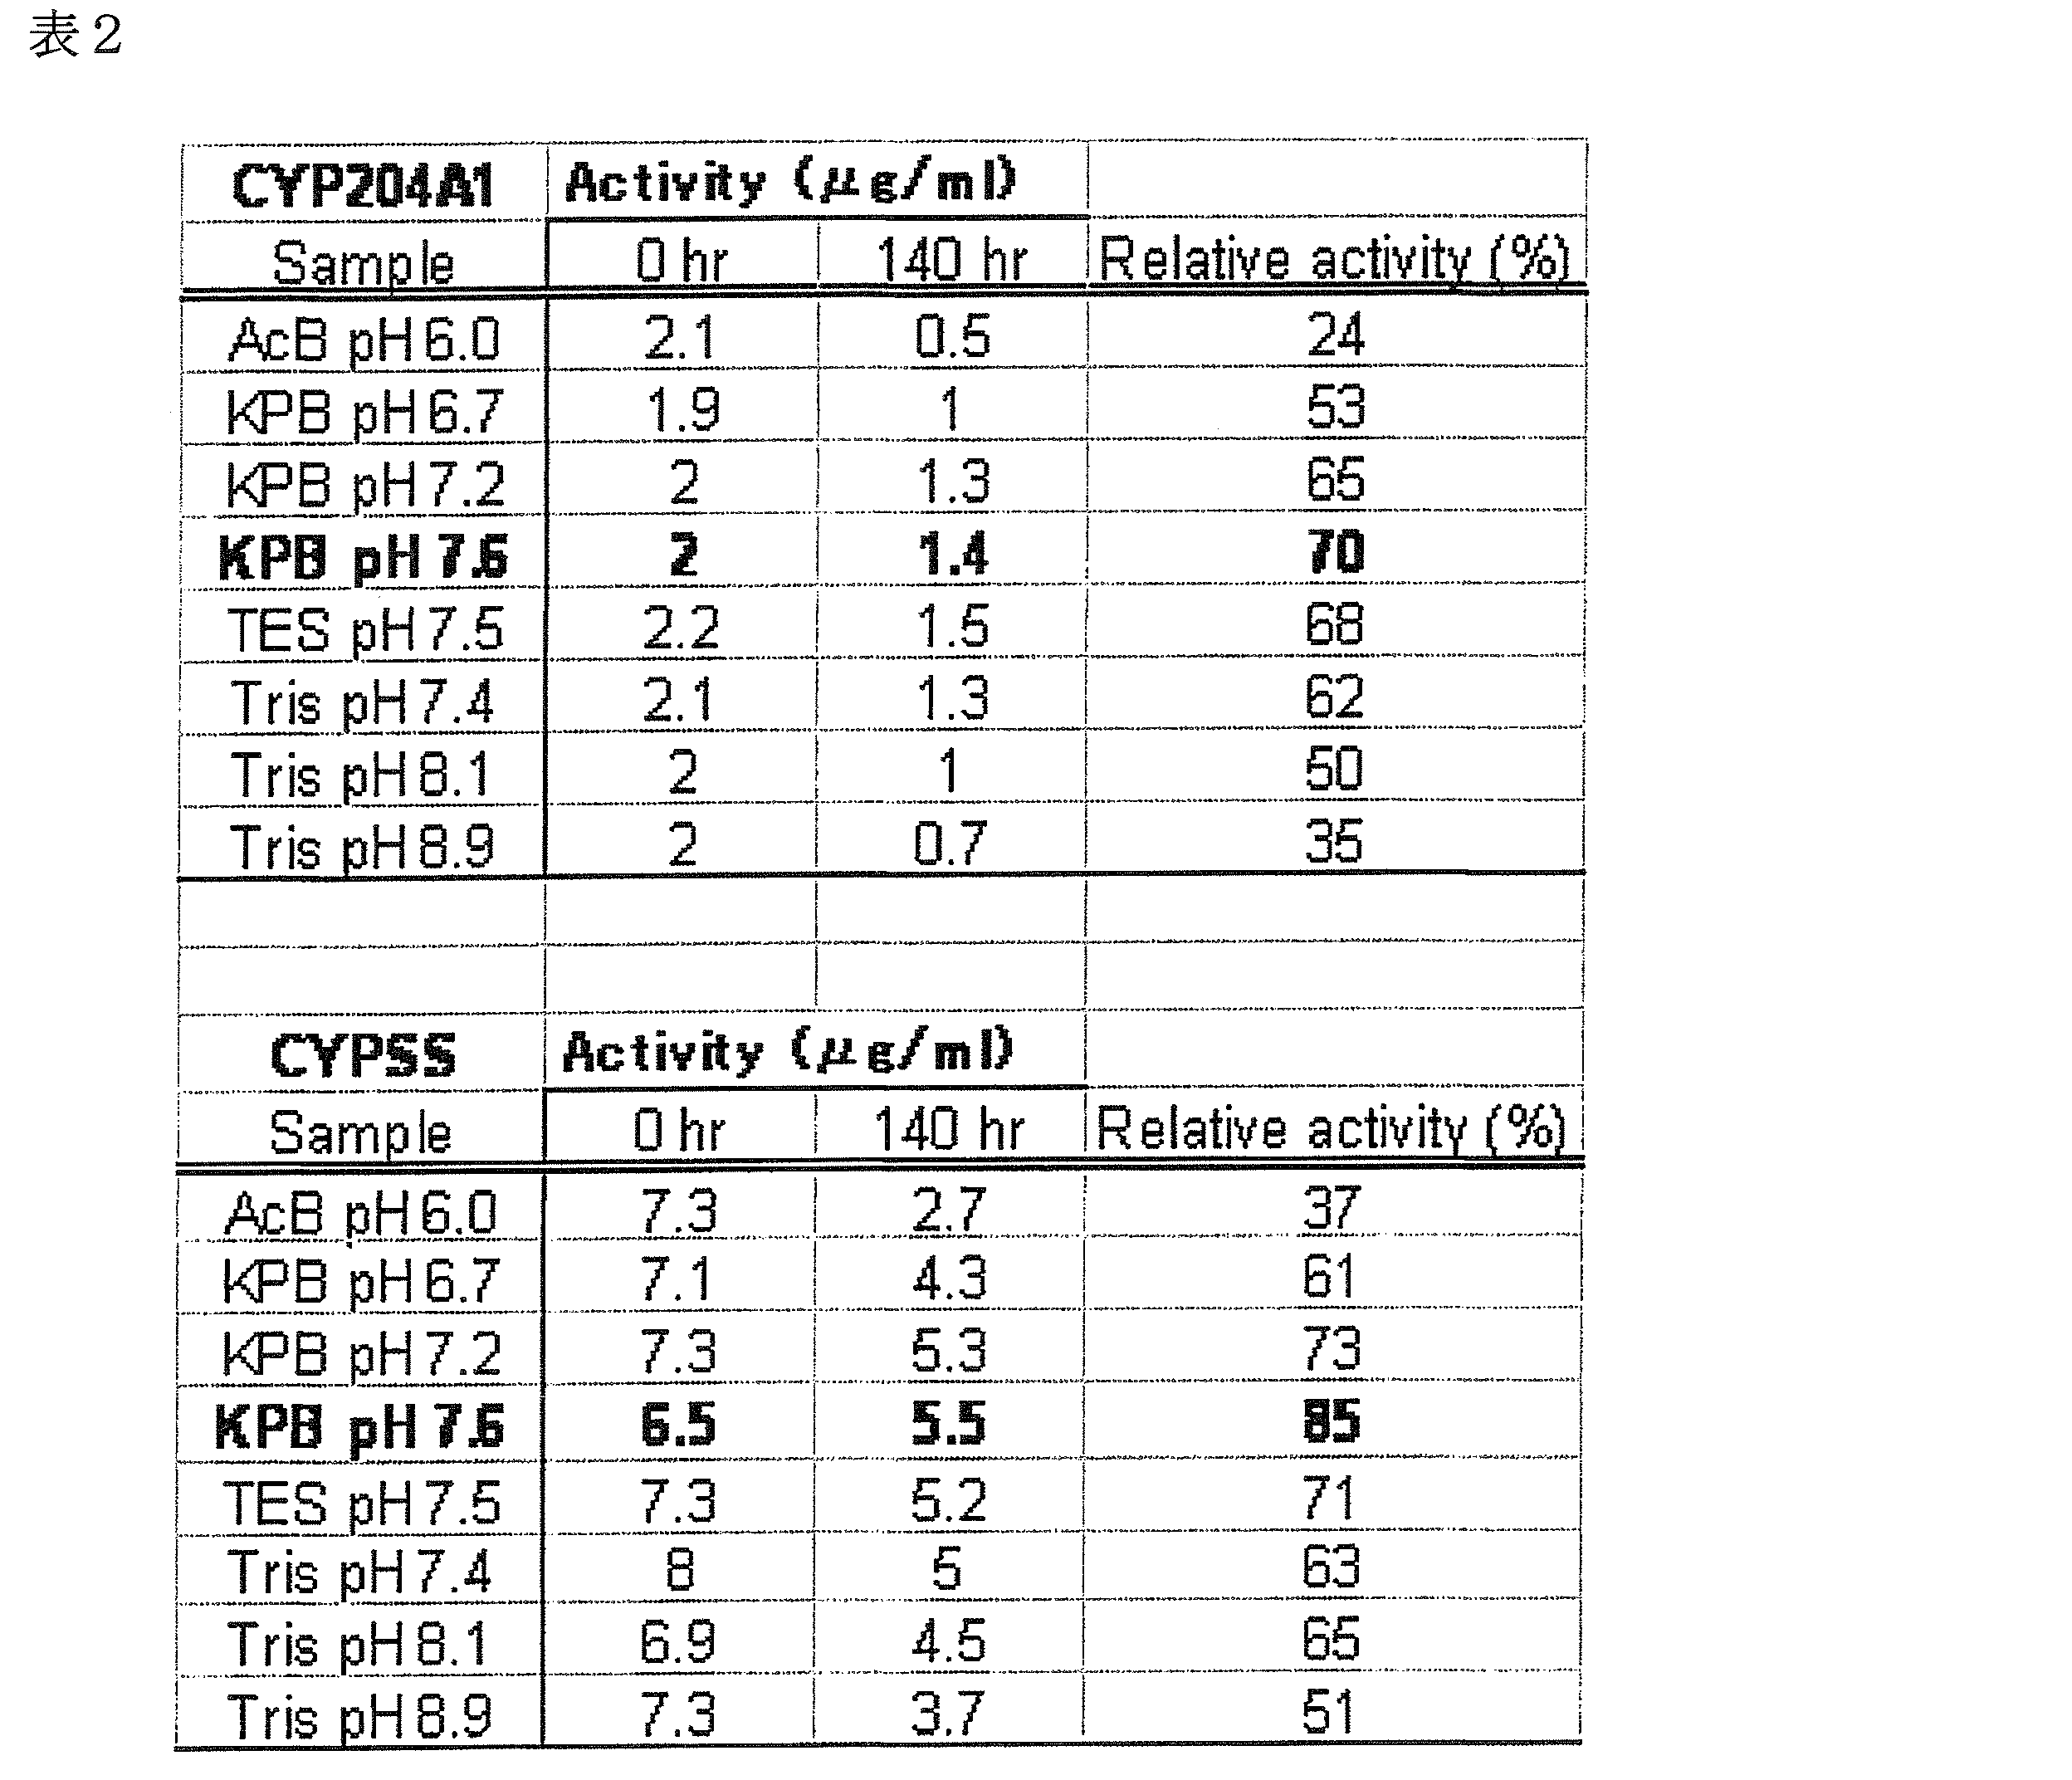 WO2010079594A1 - ステロール側鎖切断酵素蛋白質およびその利用         - Google PatentsFamily